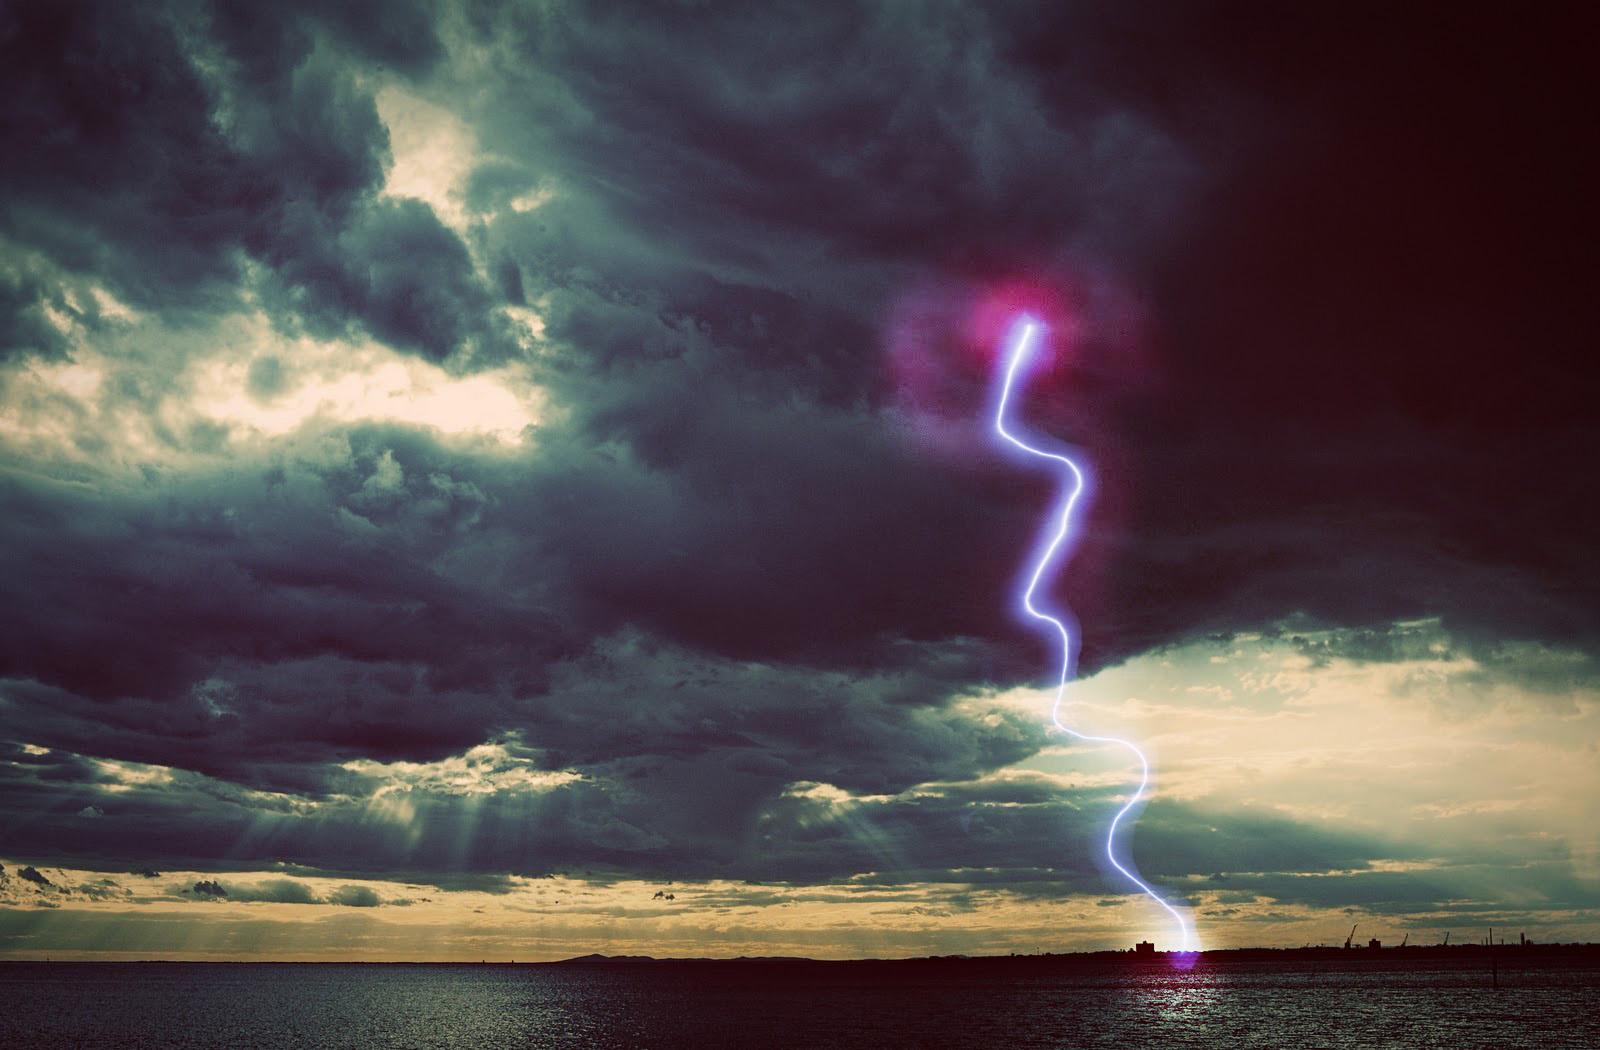 Photoshop cs5 tutorials add lightning effect on clouds in adobe photoshop cs5 tutorials baditri Choice Image